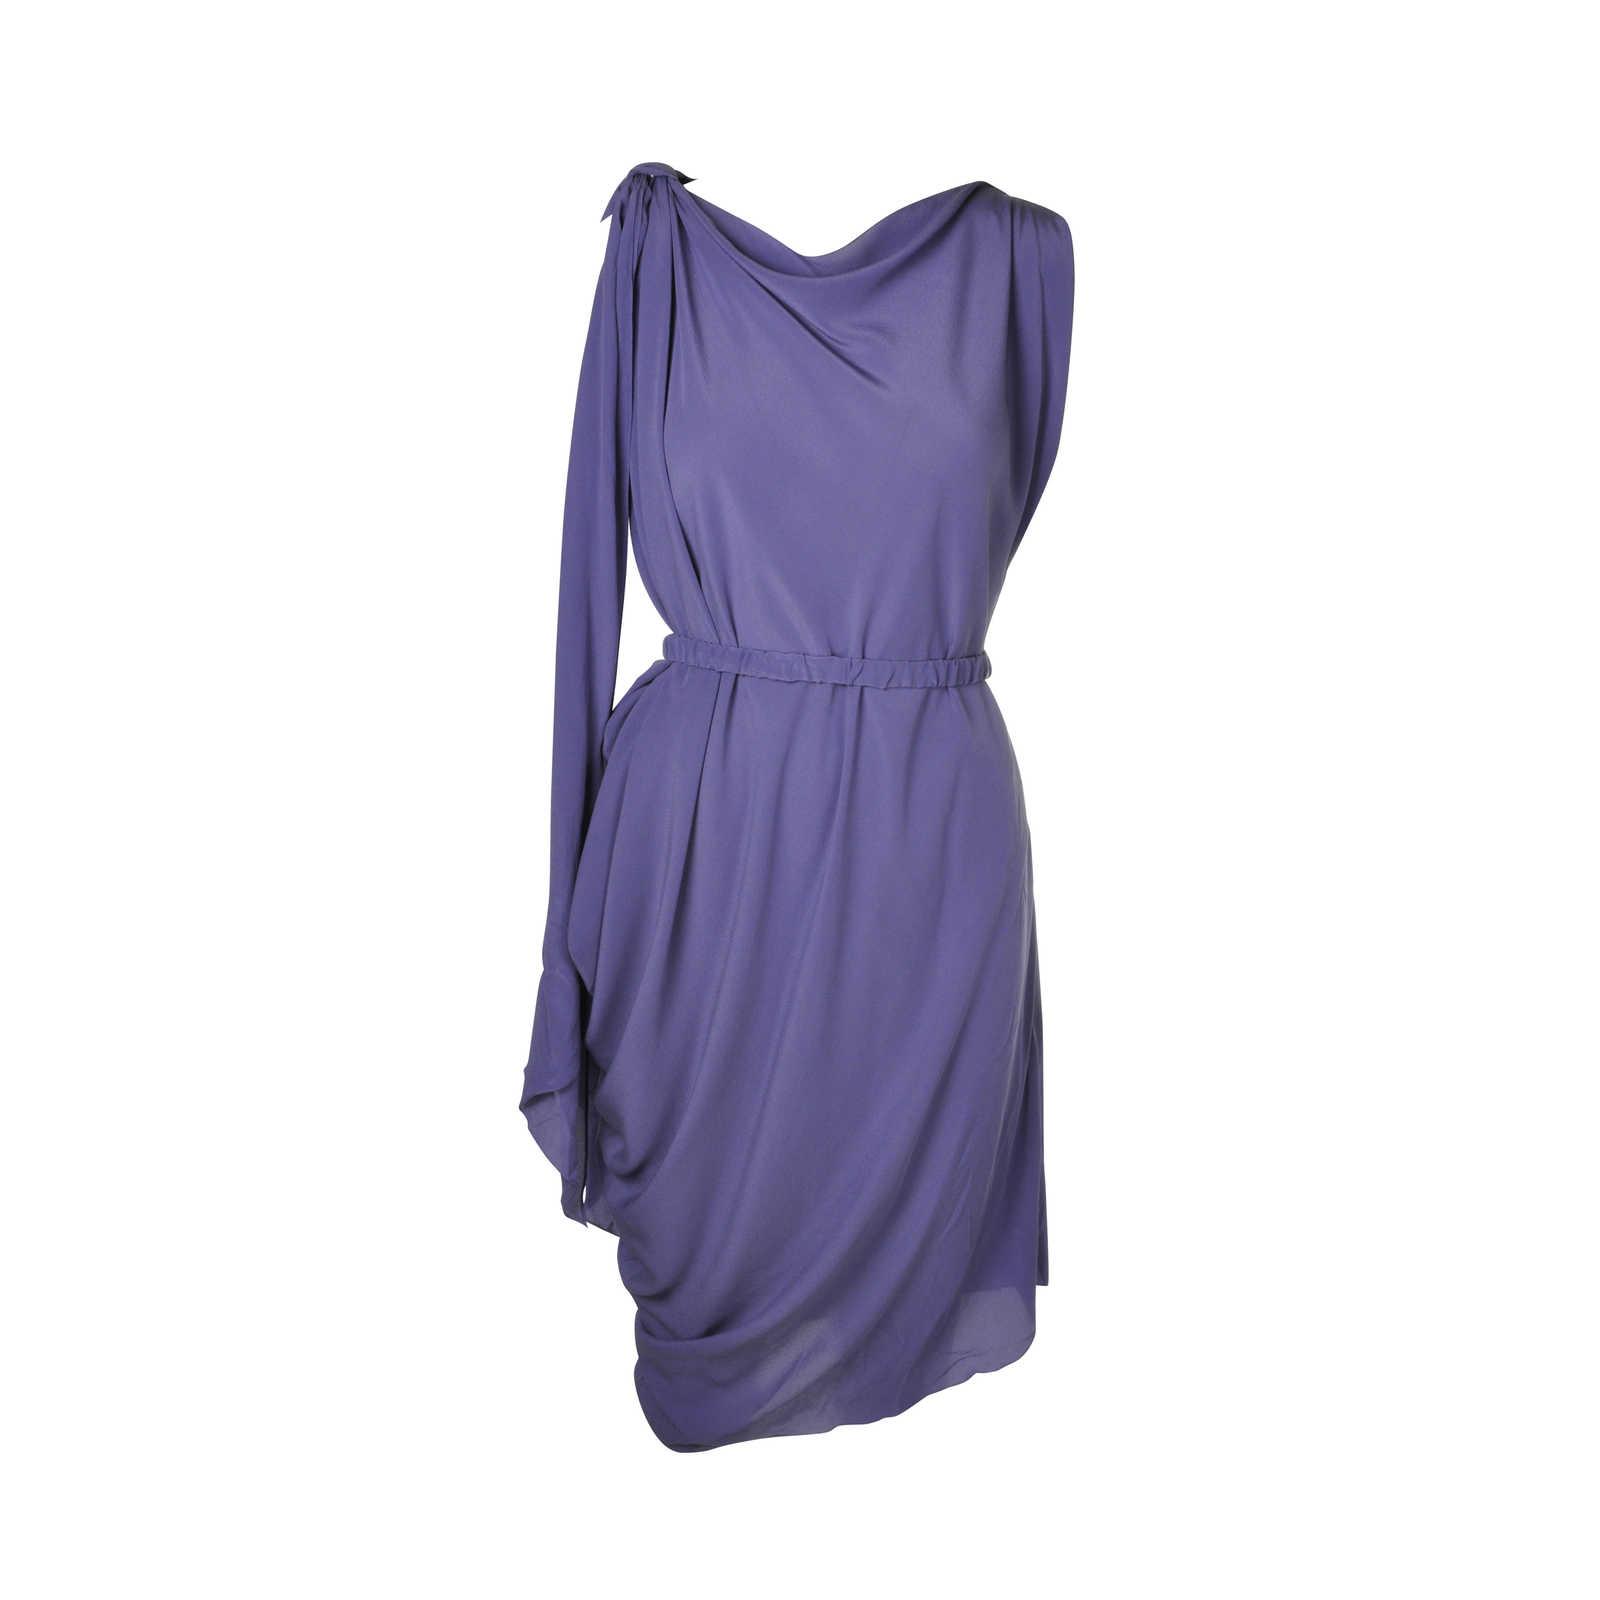 Authentic Pre Owned Lanvin Silk Asymmetrical Dress Pss 088 00008 Thumbnail